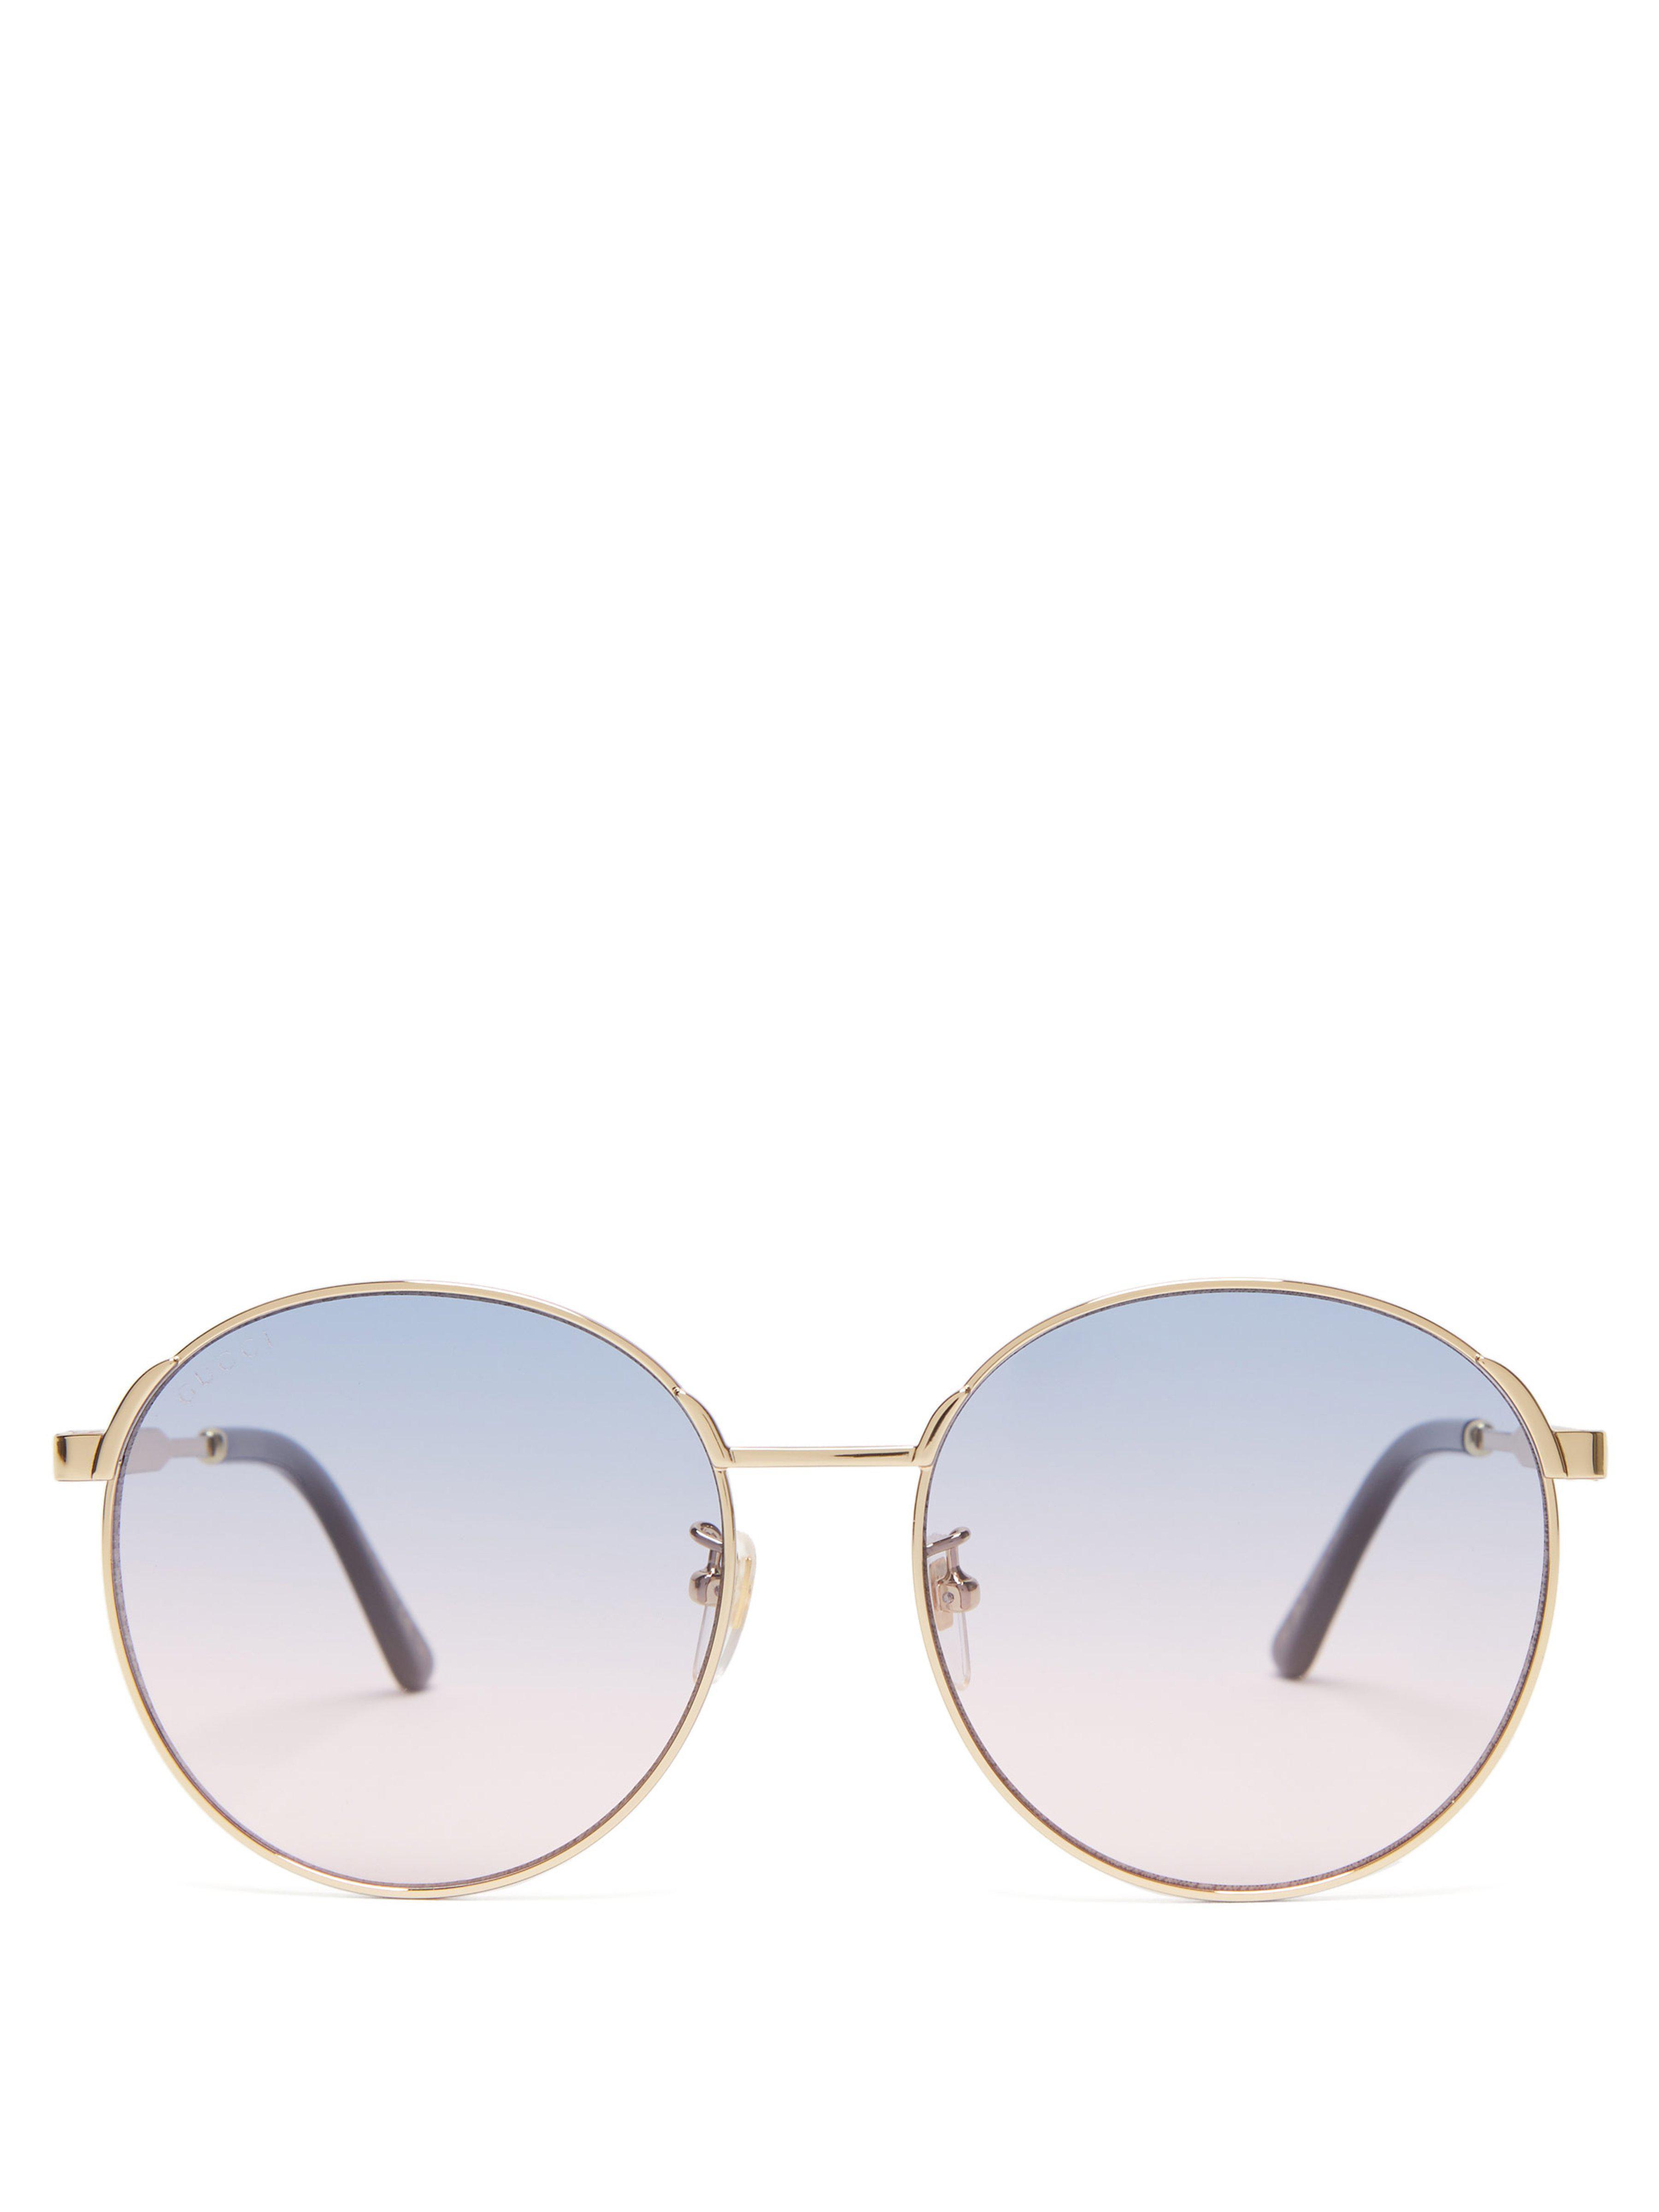 73f9b2dca1a Gucci Round Frame Sunglasses in Purple - Lyst